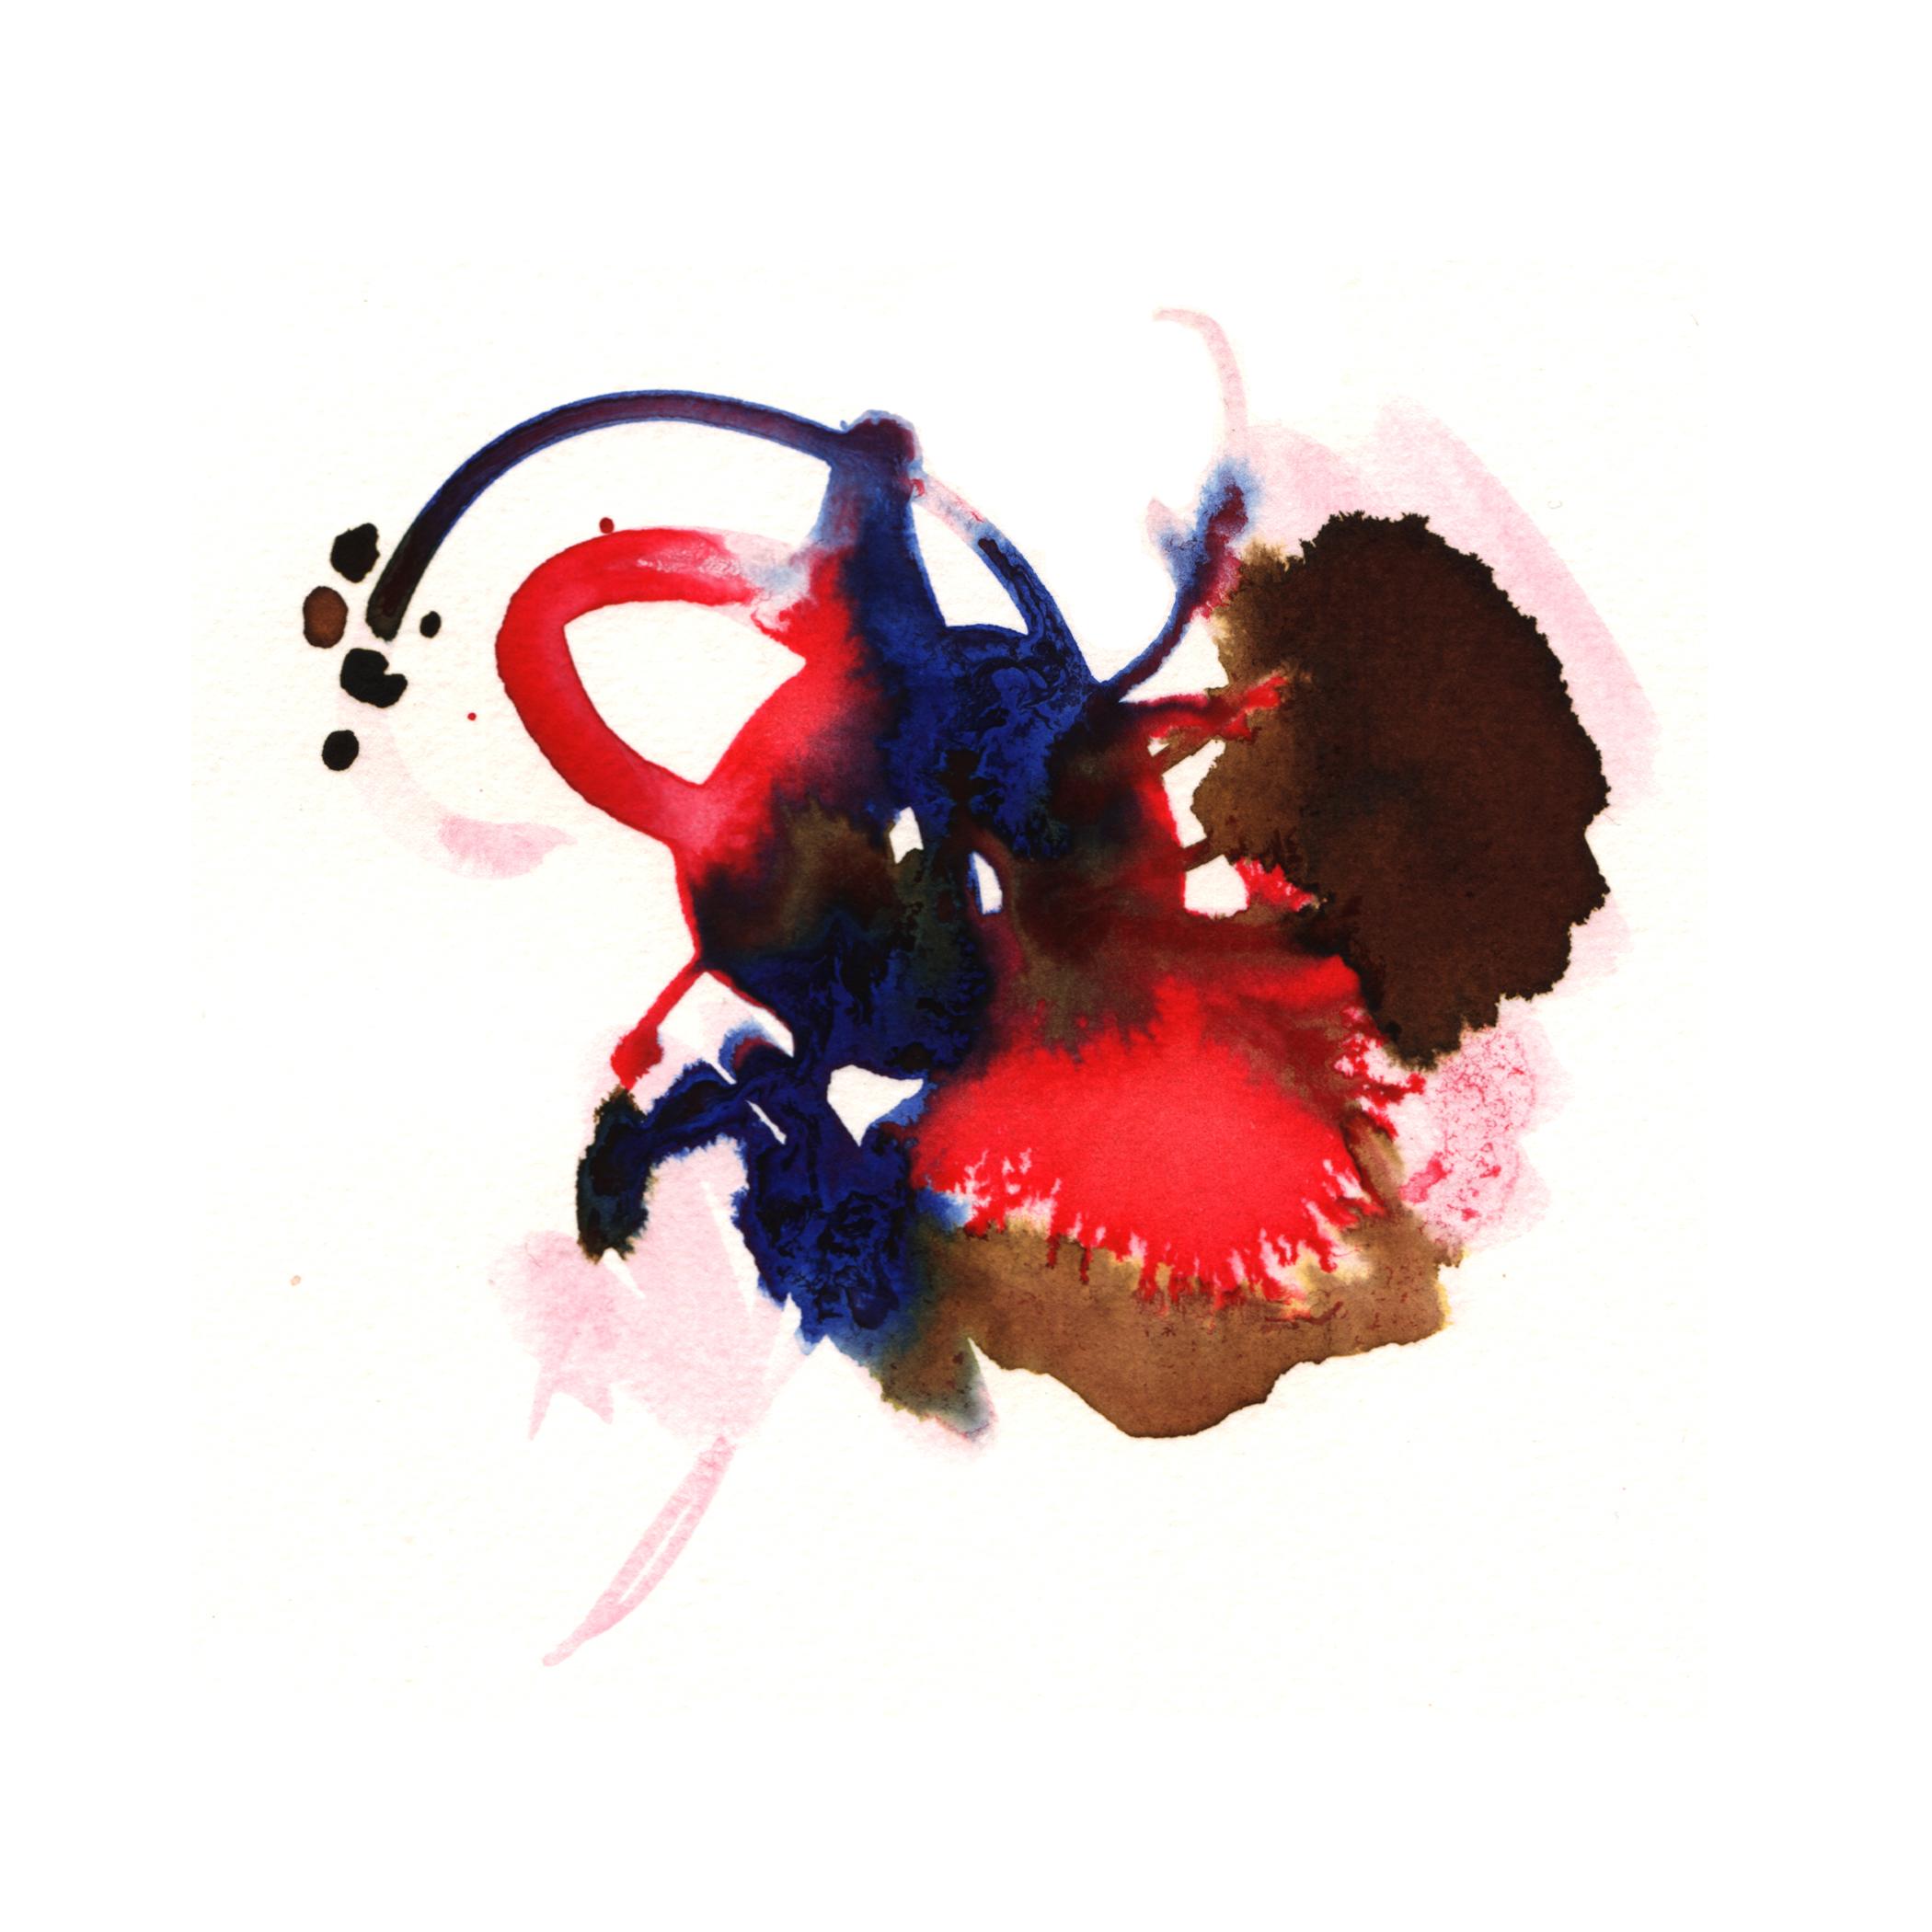 66.Hibiscus.4.15.14.jpg